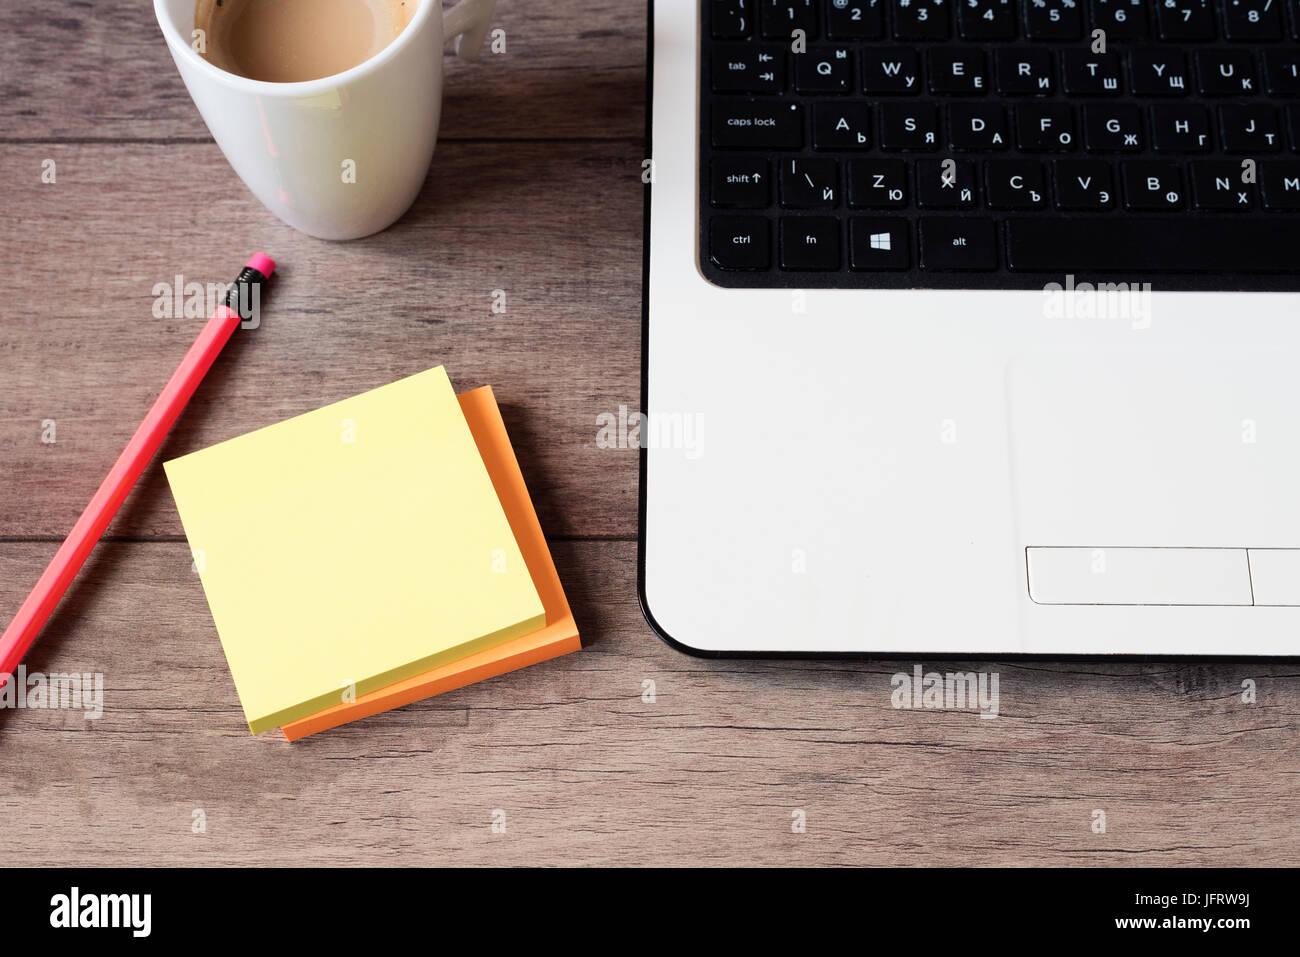 Image de bureau bois bureau avec ordinateur portable clavier jolie